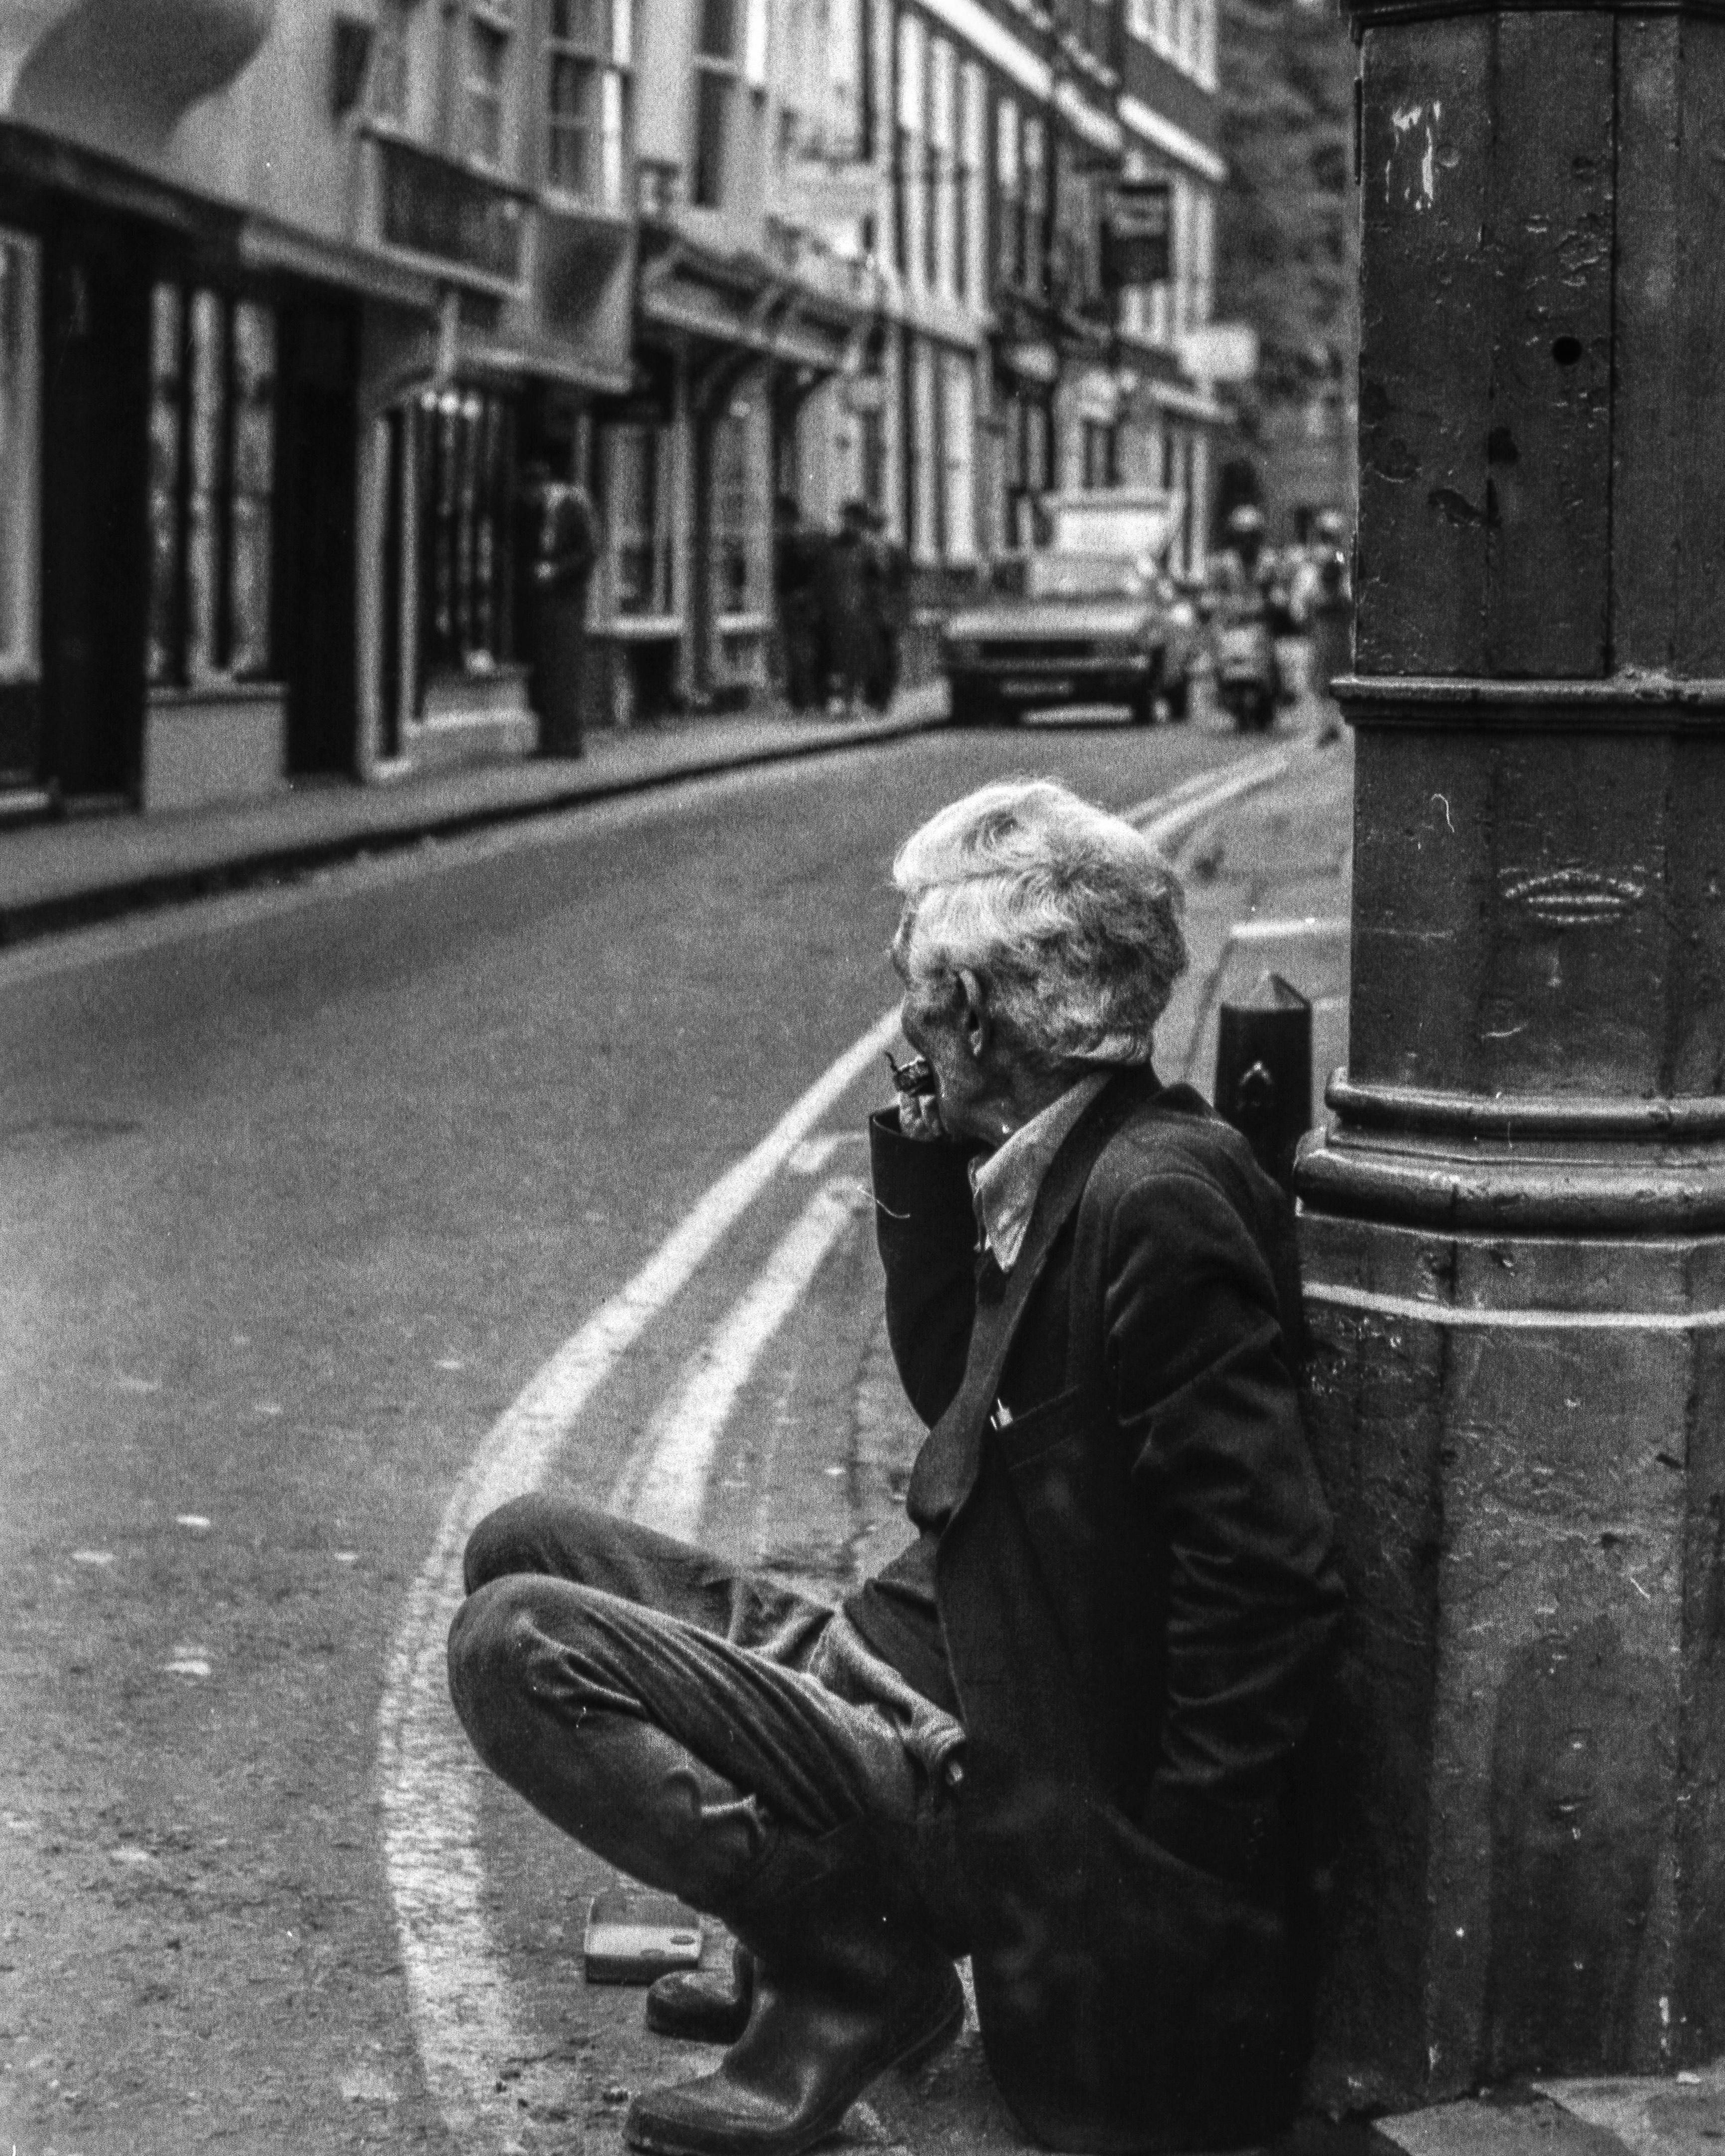 York (late 1970s)